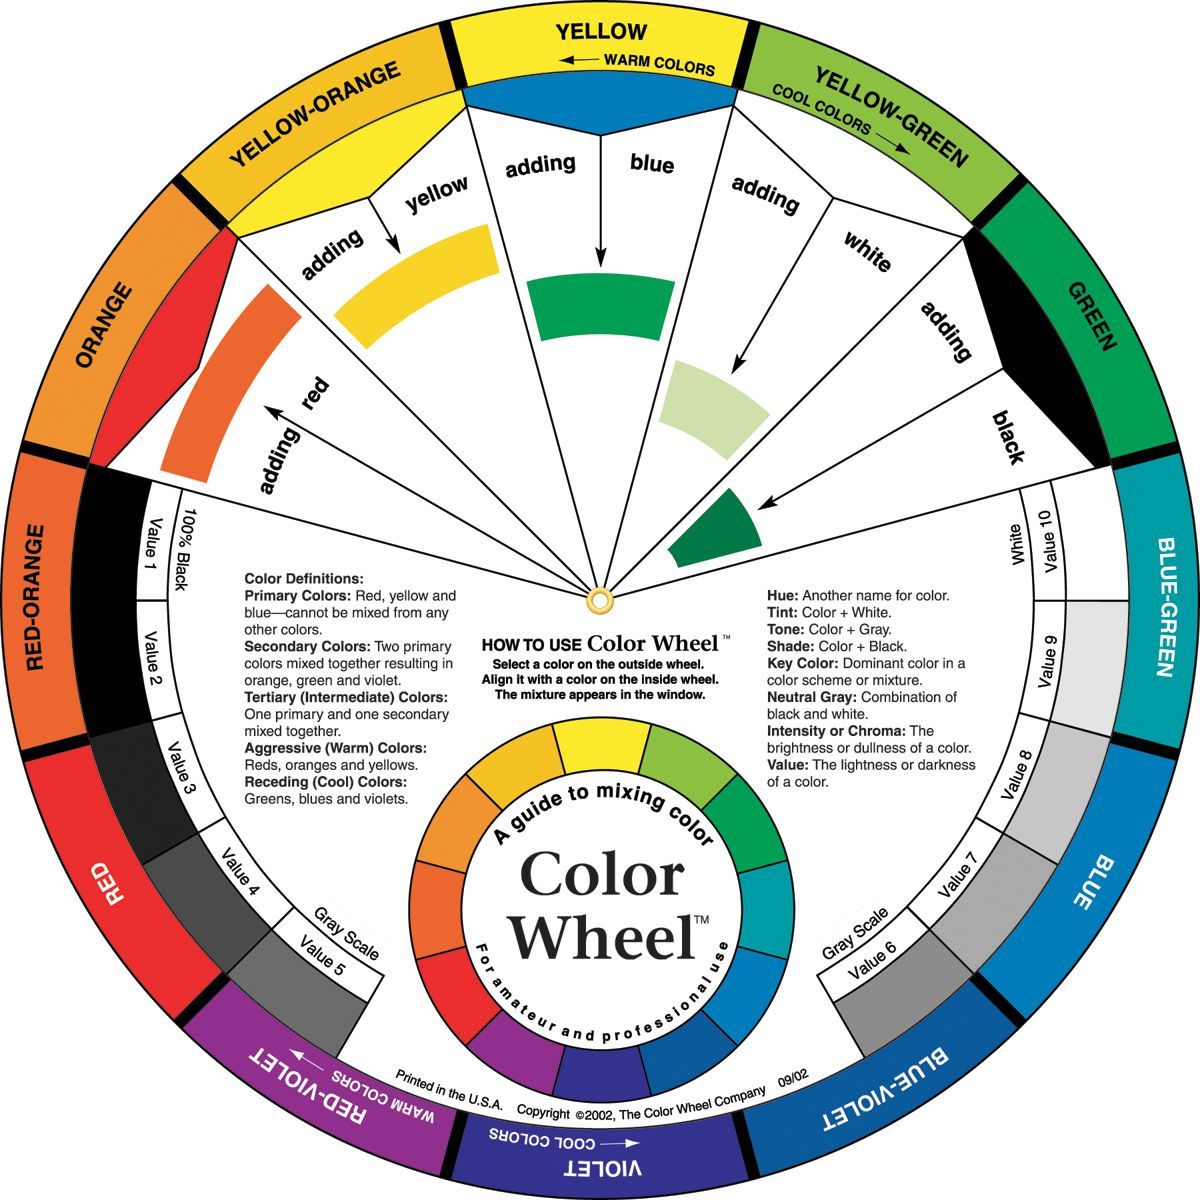 Color Wheel 9 1 4 Color Mixing Guide Color Wheel Color Mixing